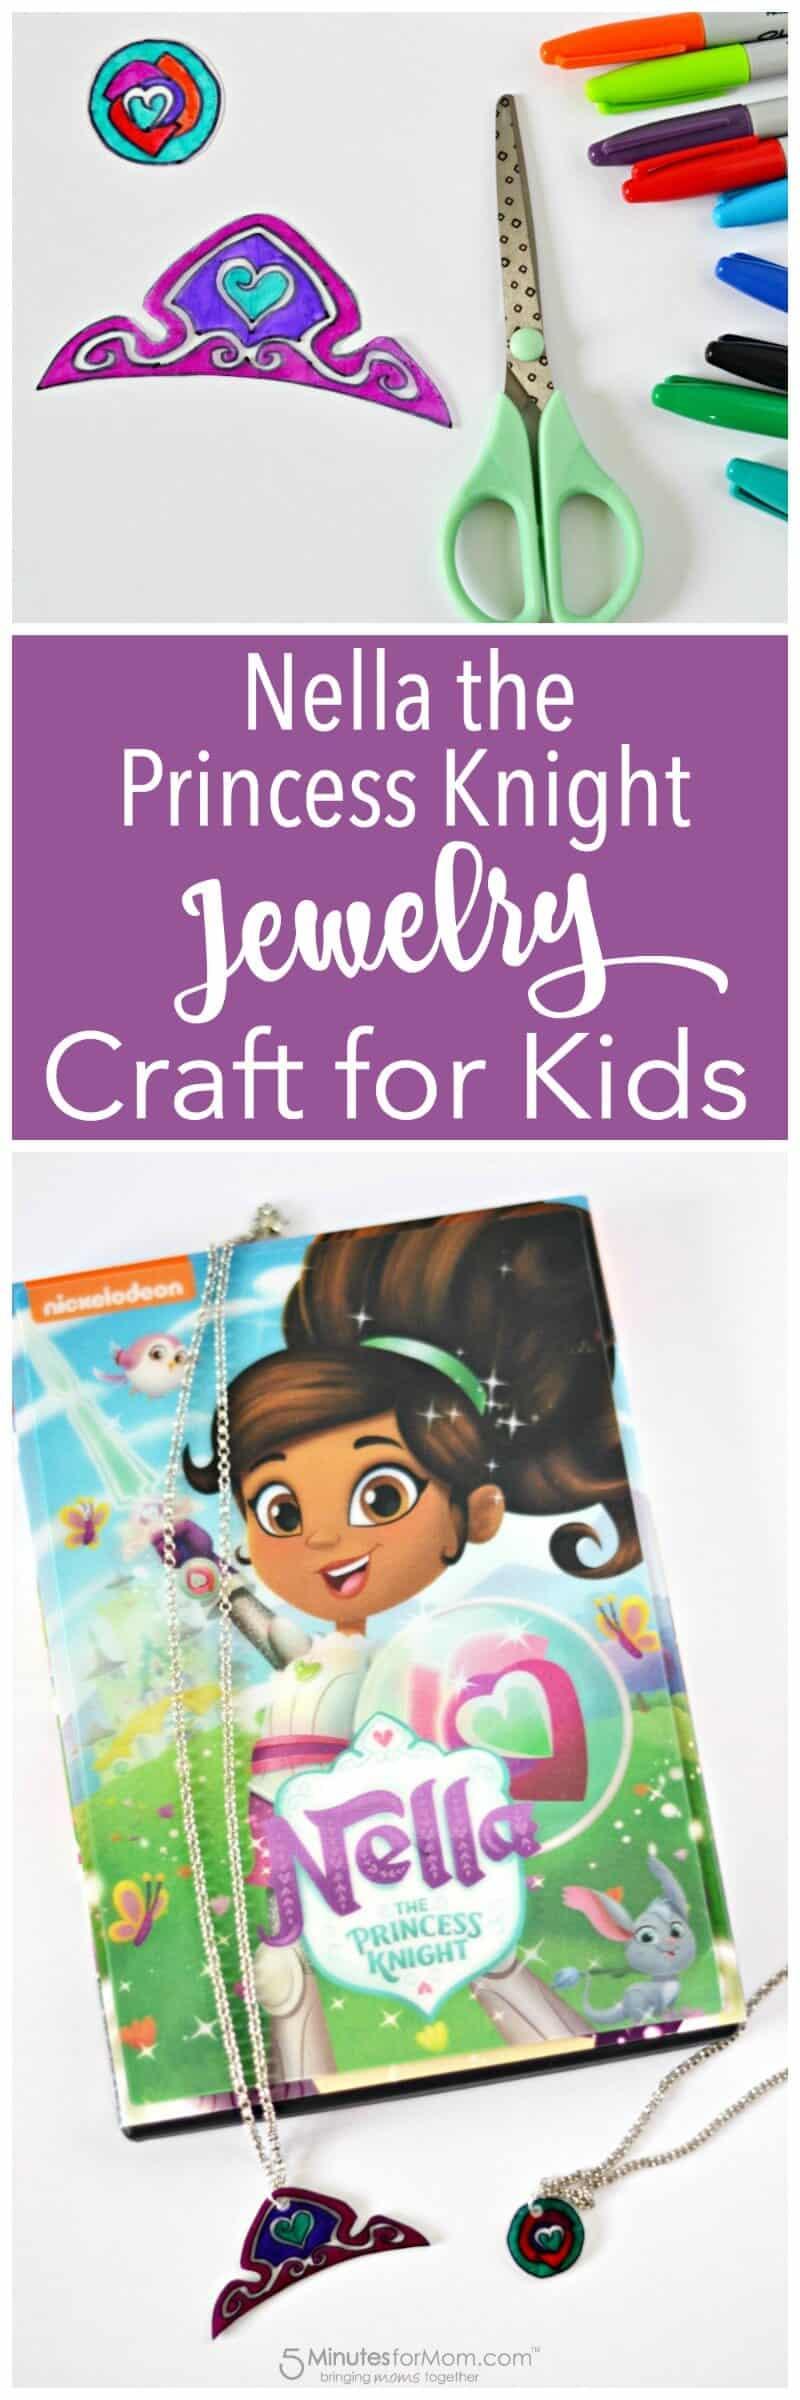 Nella The Princess Knight Craft for Kids